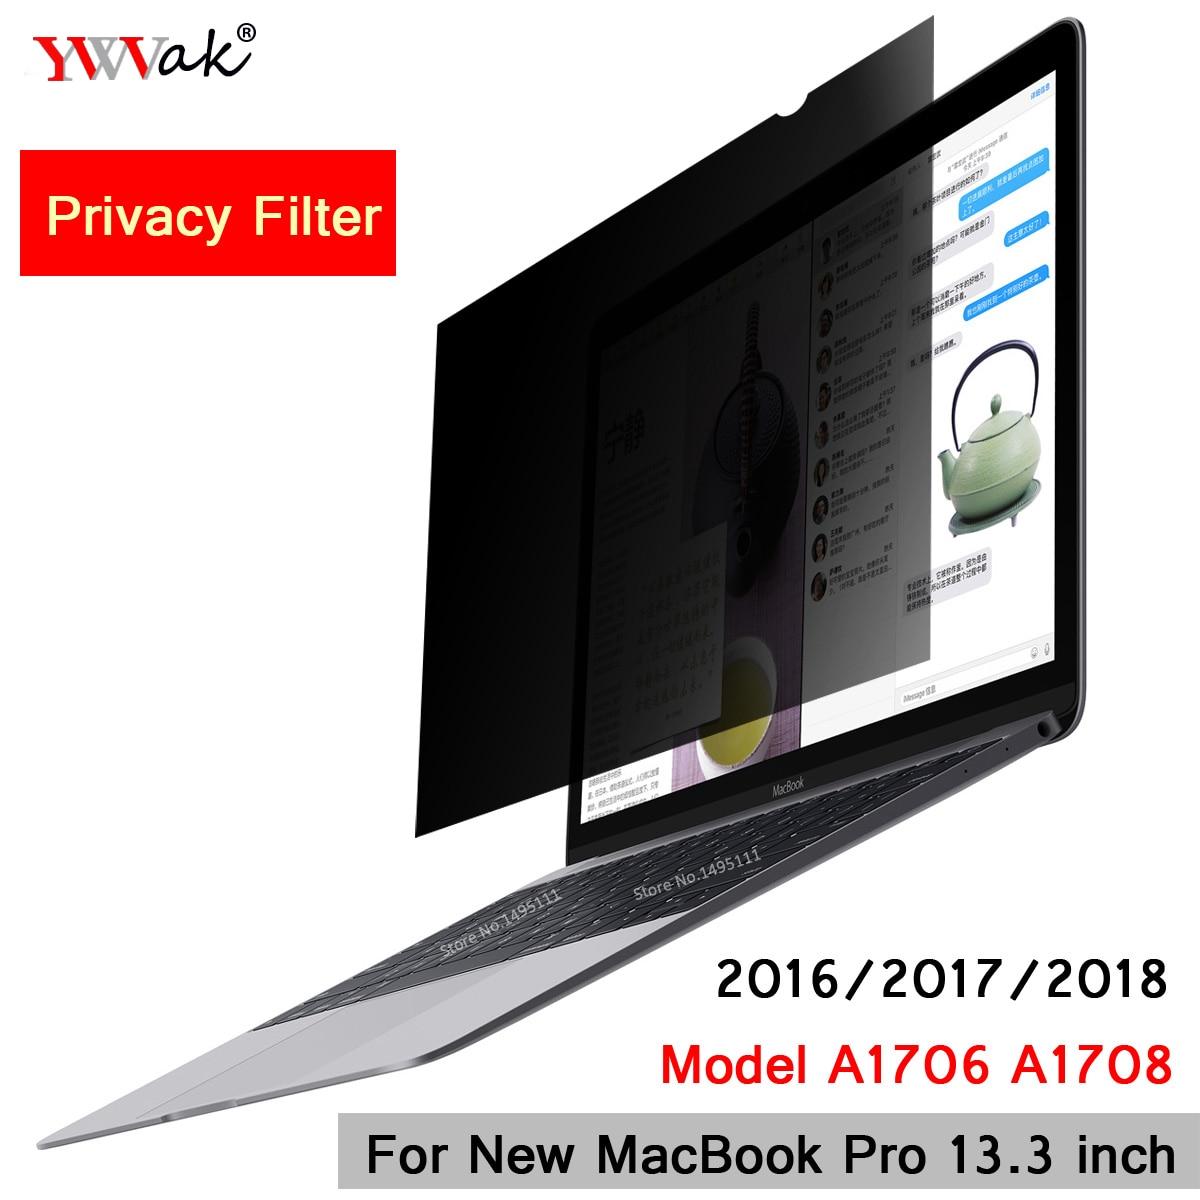 Für 2016/2017/2018 Neue Macbook Pro 13,3 Zoll Touch Bar Modell A1706 A1708 Privatsphäre Filter Bildschirme Schutz Film 299mm * 195mm